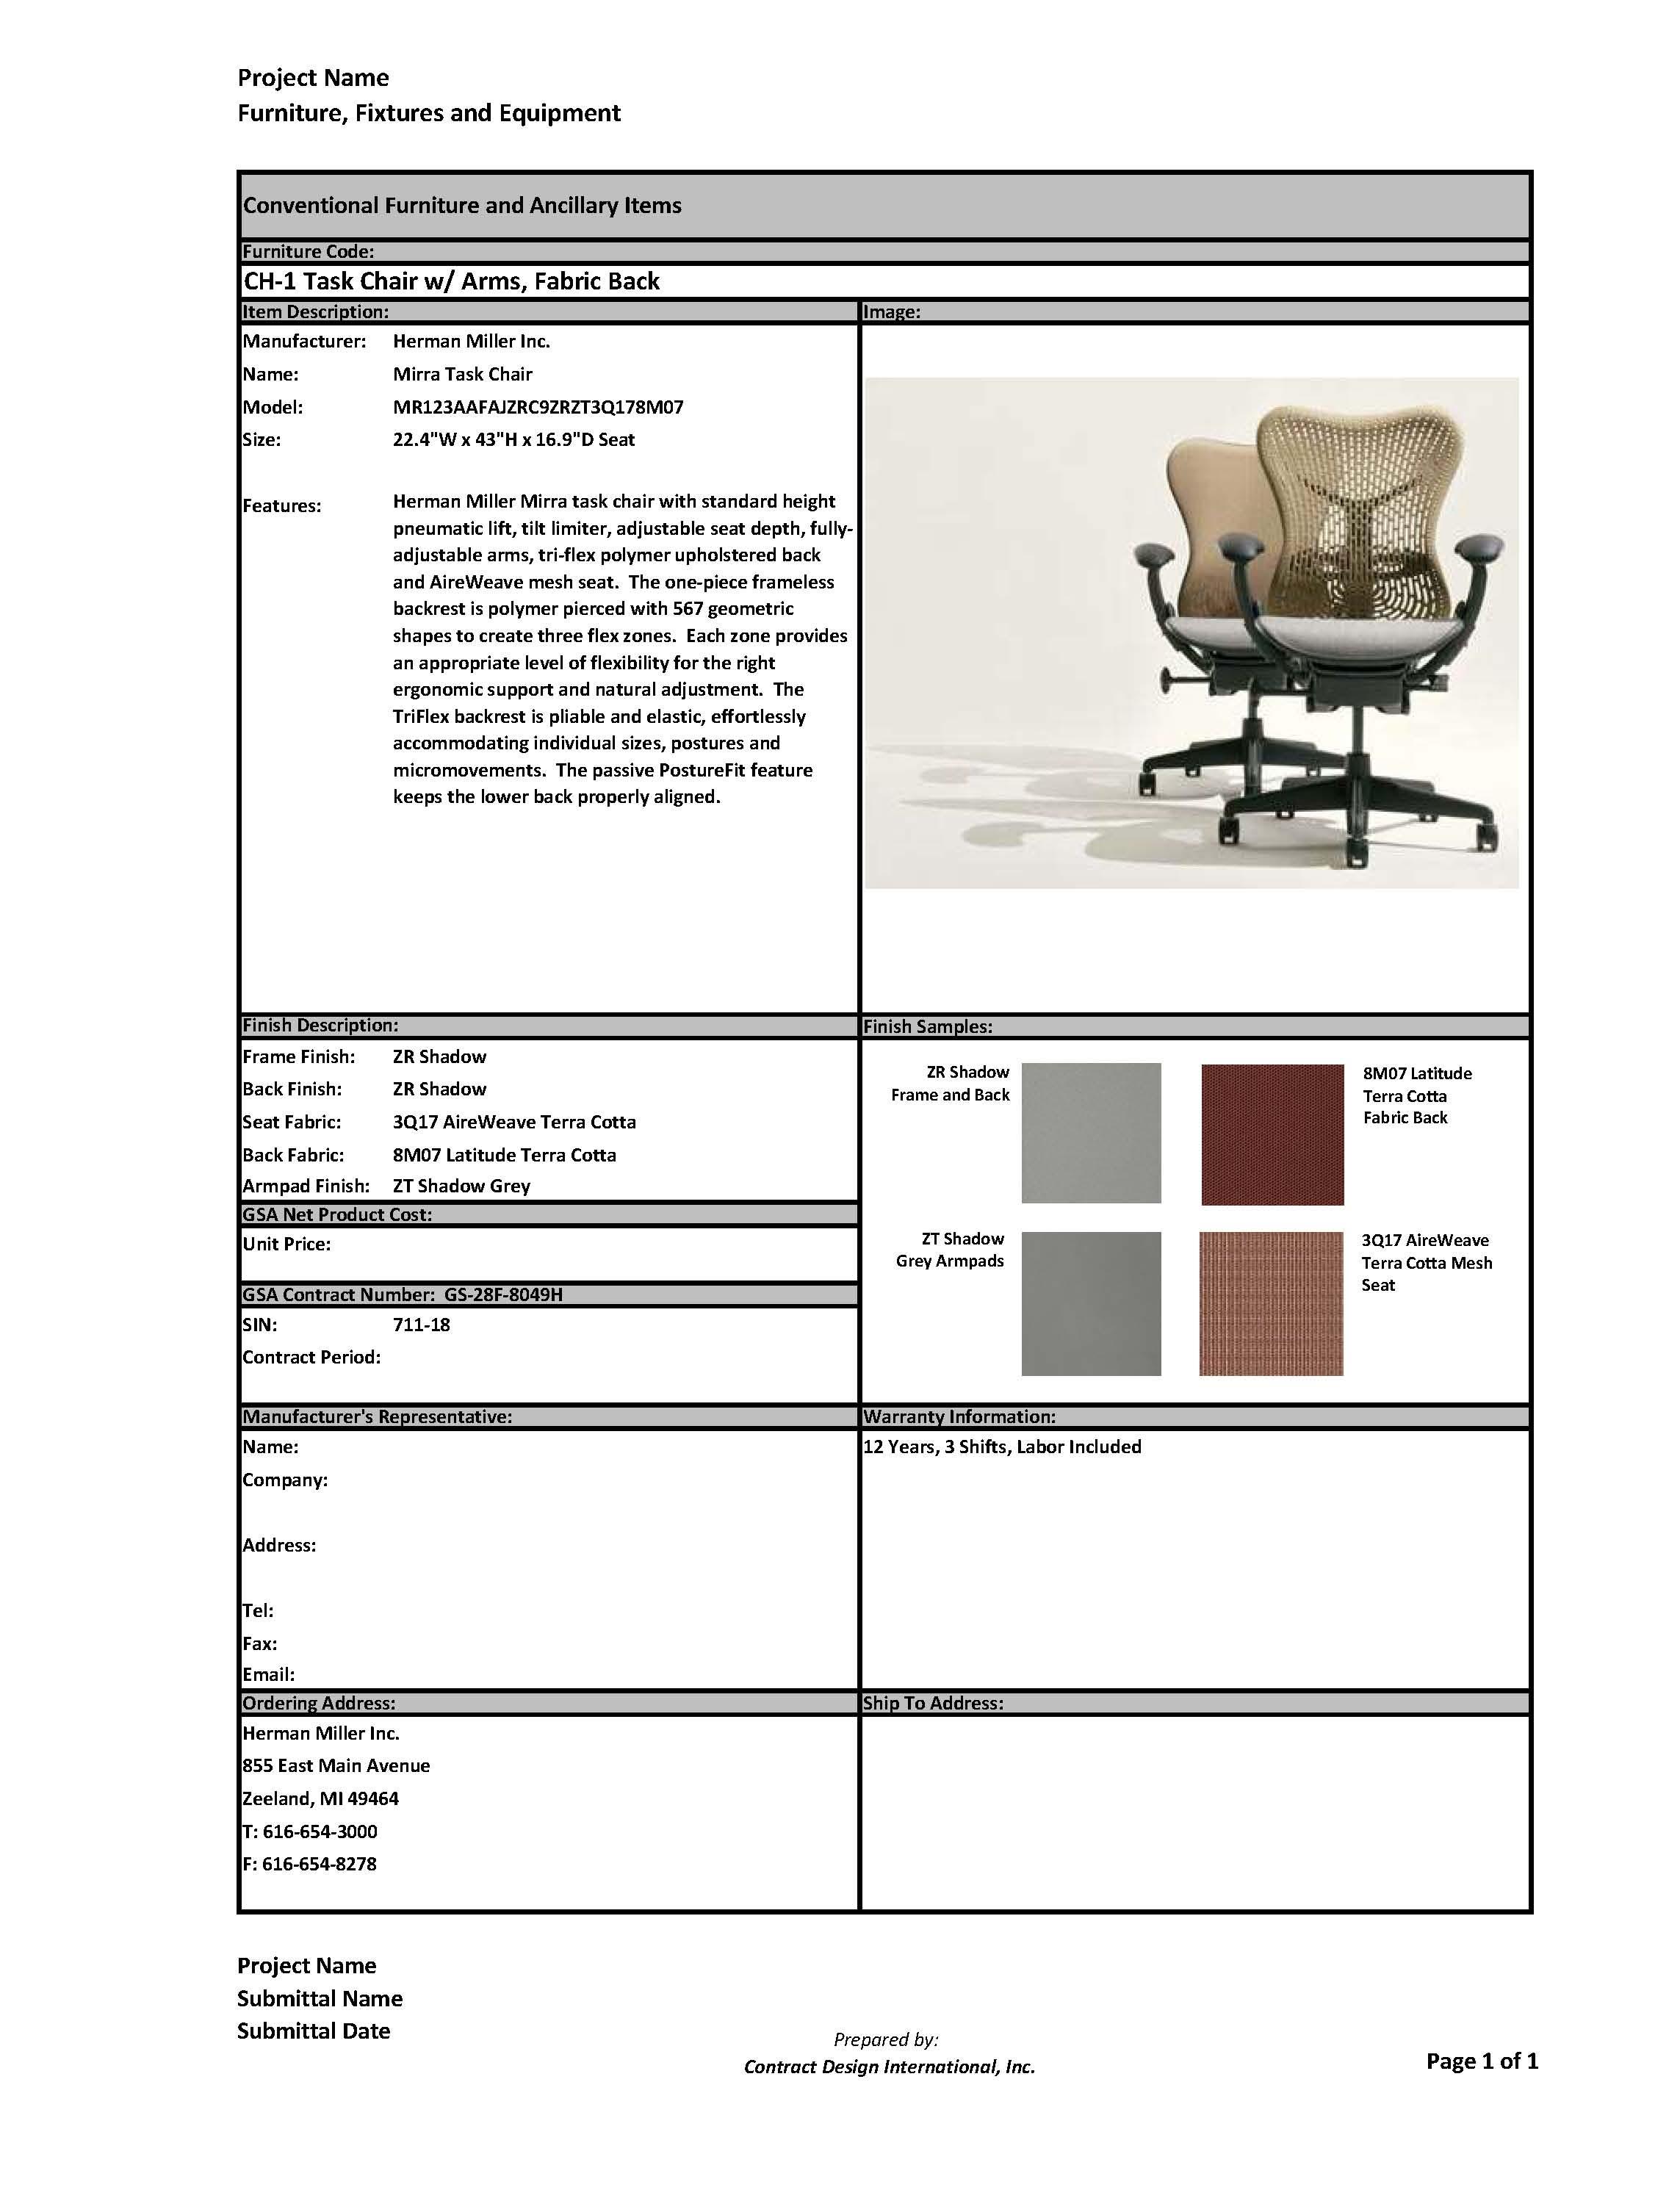 FF&E Cut Sheets